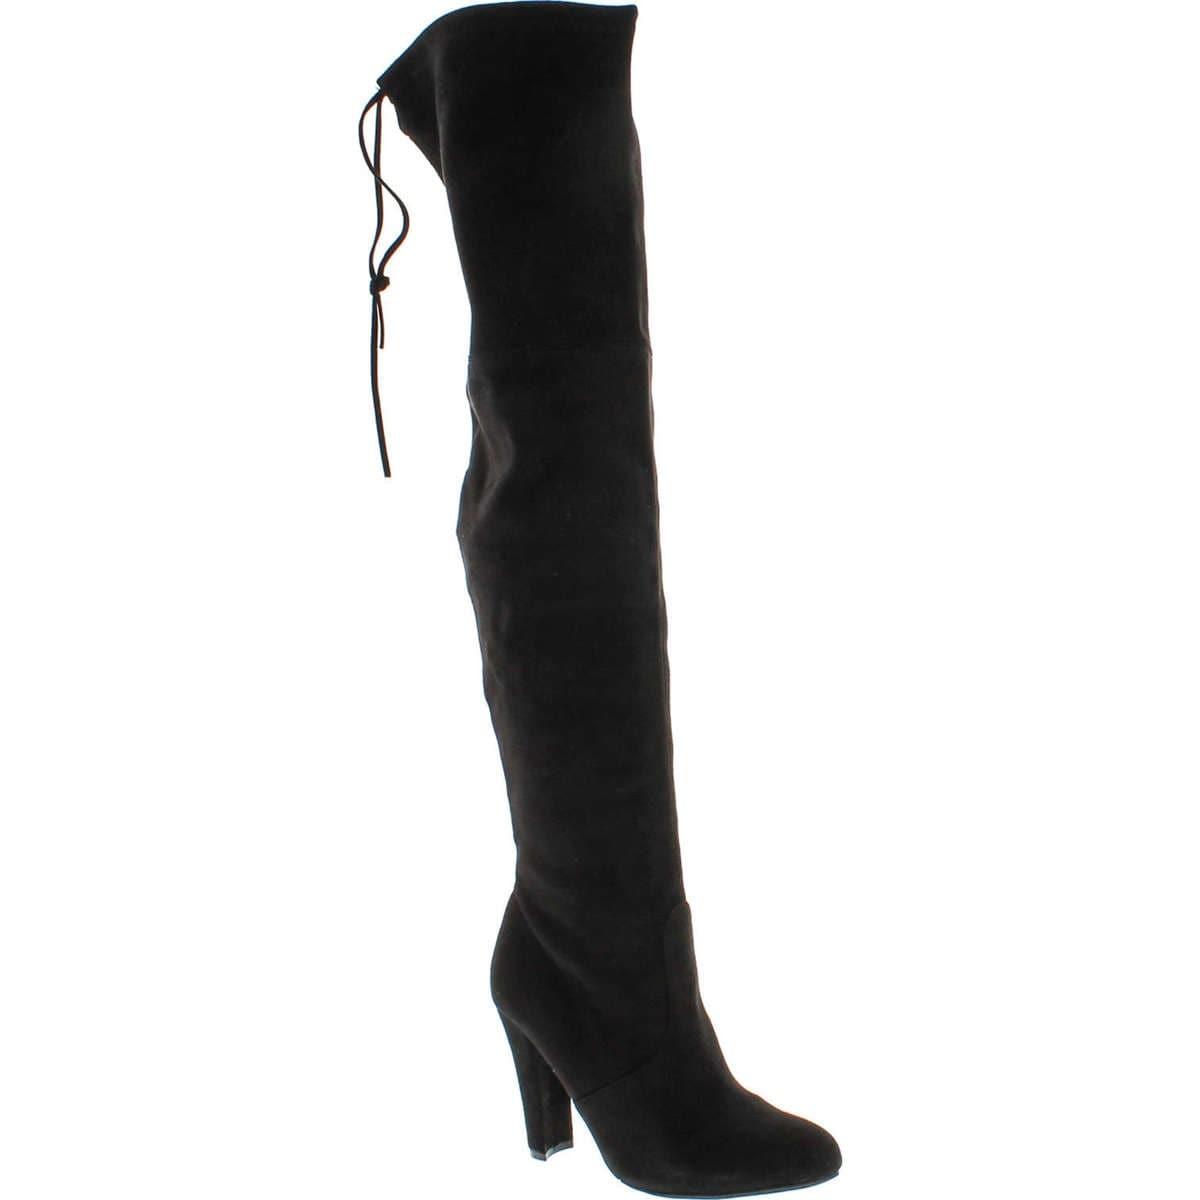 raíz Araña de tela en embudo Inválido  Shop Steve Madden Women's Gorgeous Winter Boot - Black - Overstock -  14820241